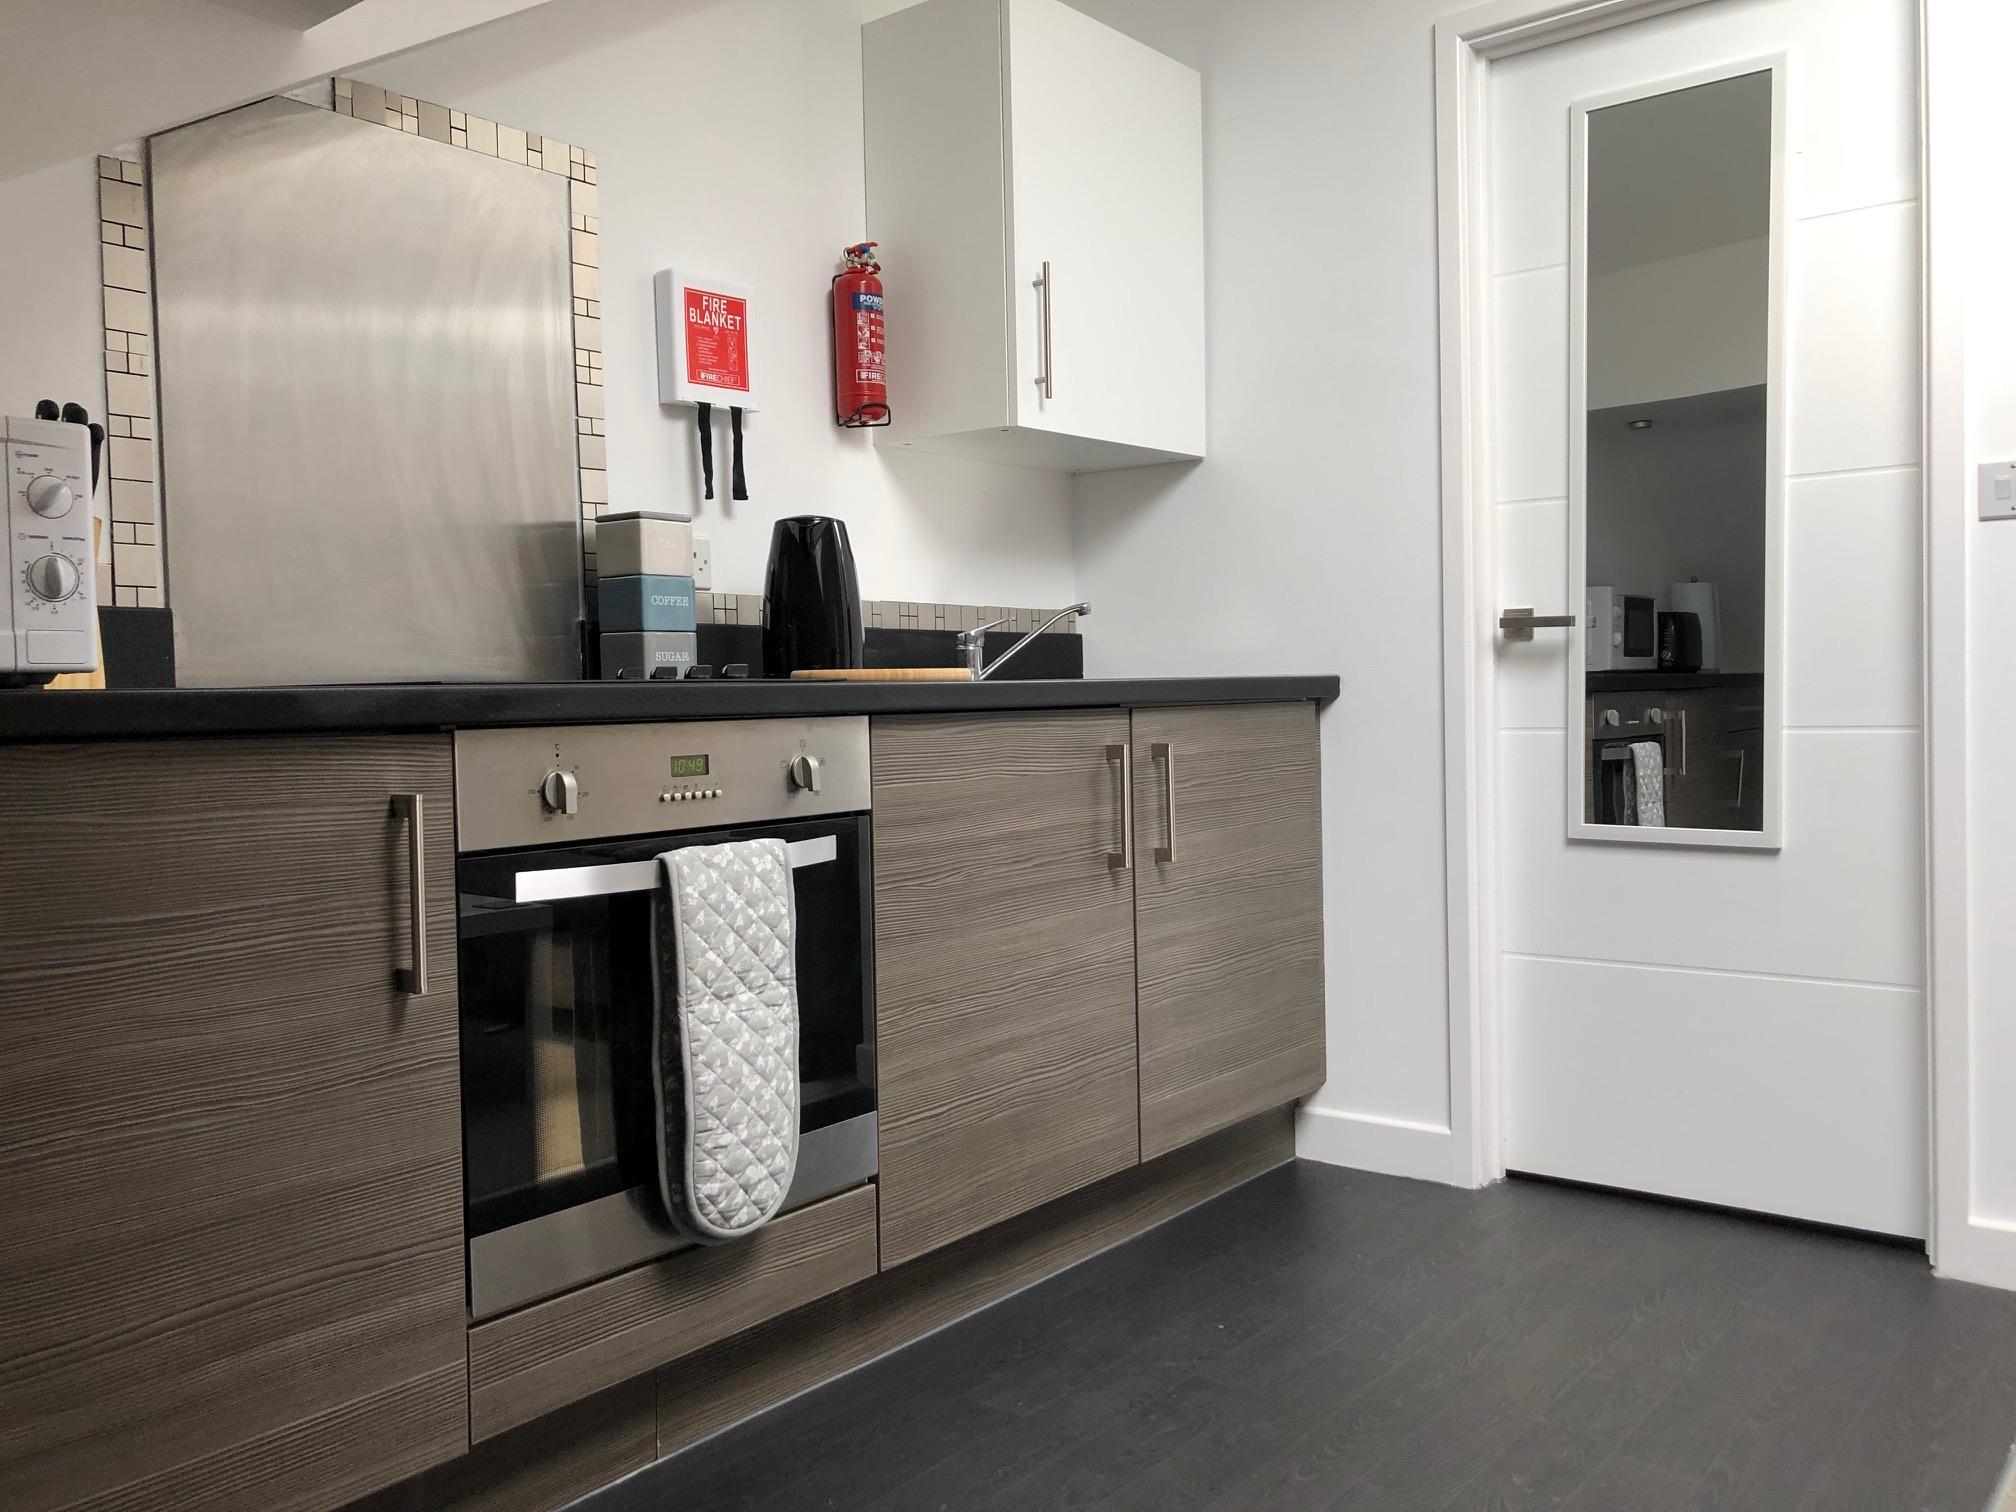 72SEH Kitchen area and door to shower room.jpg